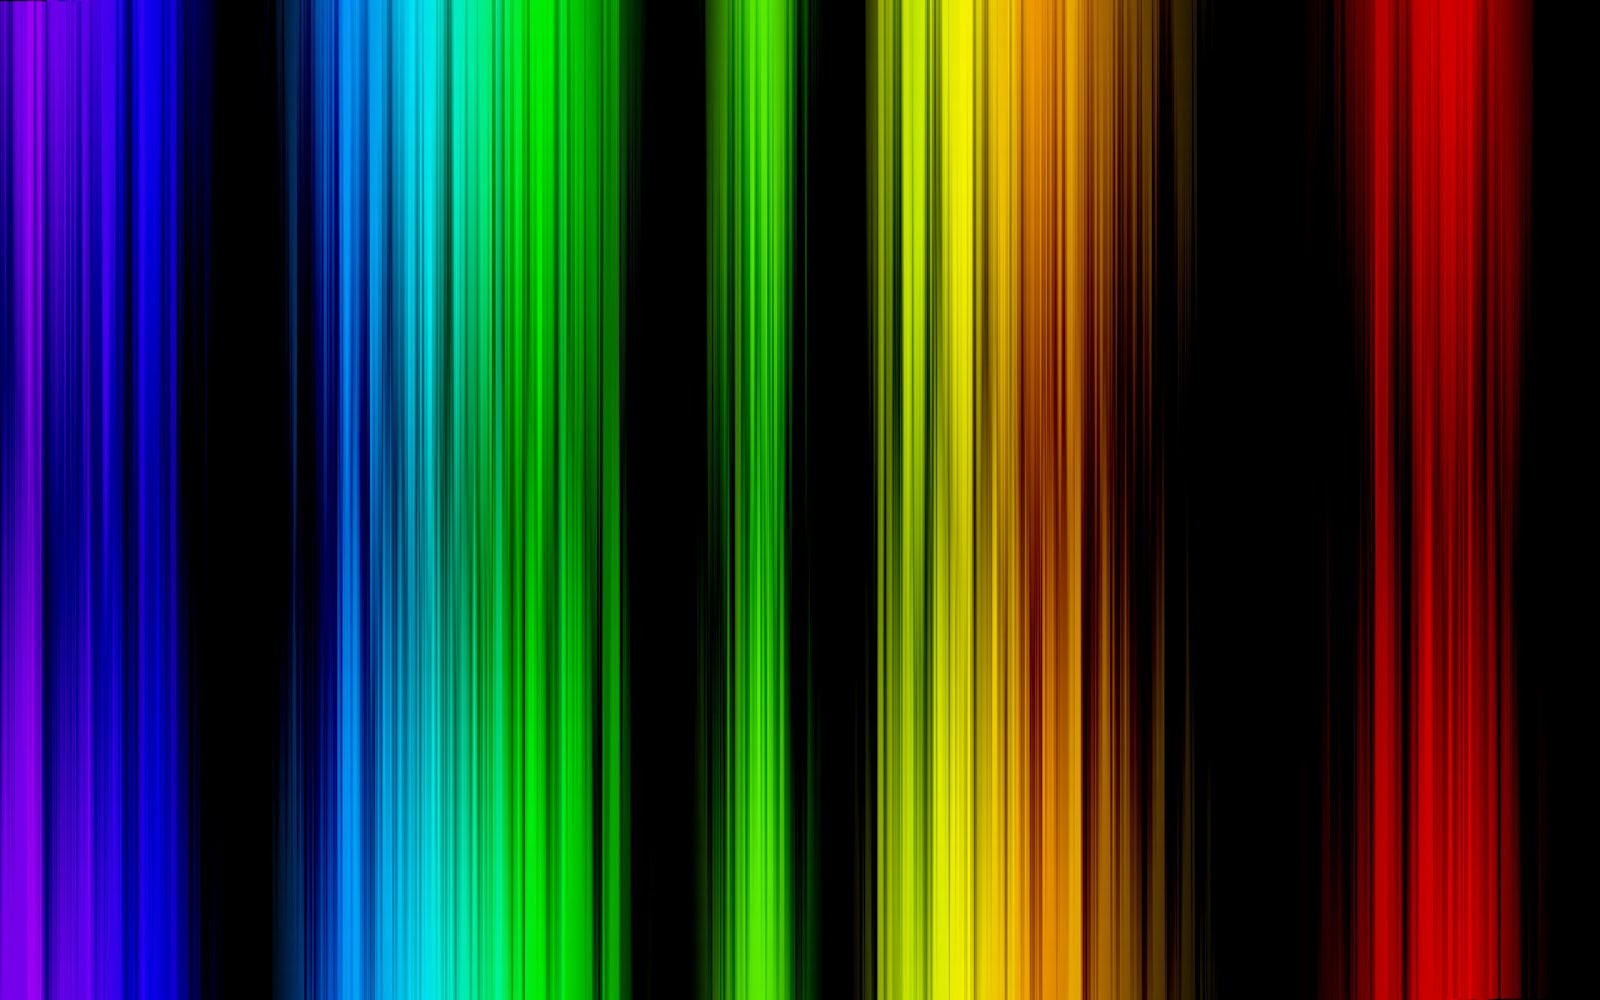 http://2.bp.blogspot.com/-hRTwzimfUOM/UEONNoQeYTI/AAAAAAAAA0w/nR7lS5I6hvY/s1600/colorful%2Bwallpapers%2Bhd%2B5.jpg